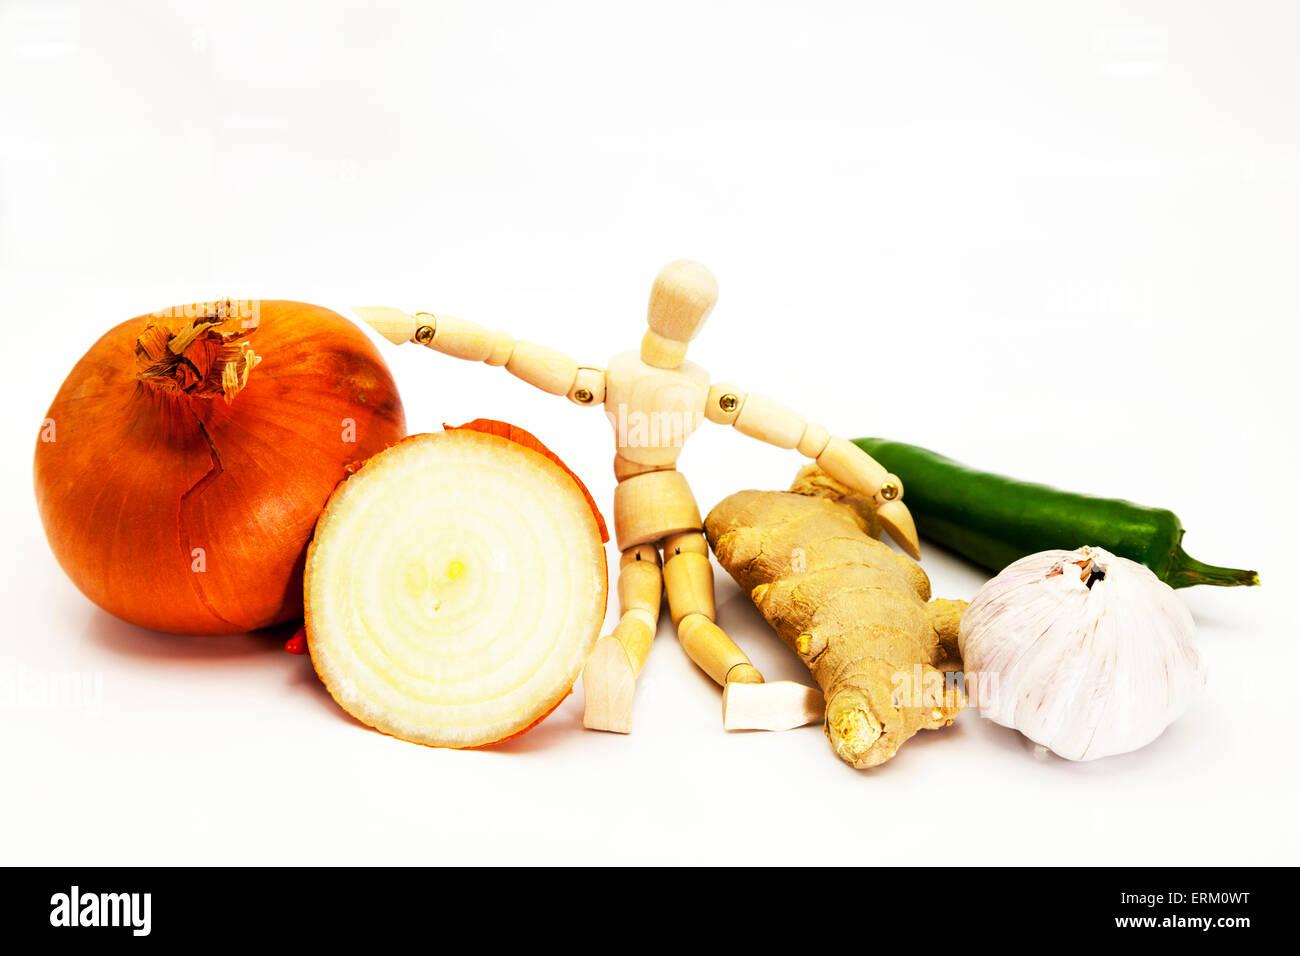 garlic ginger chili onion flavour flavouring food heathy fresh spice